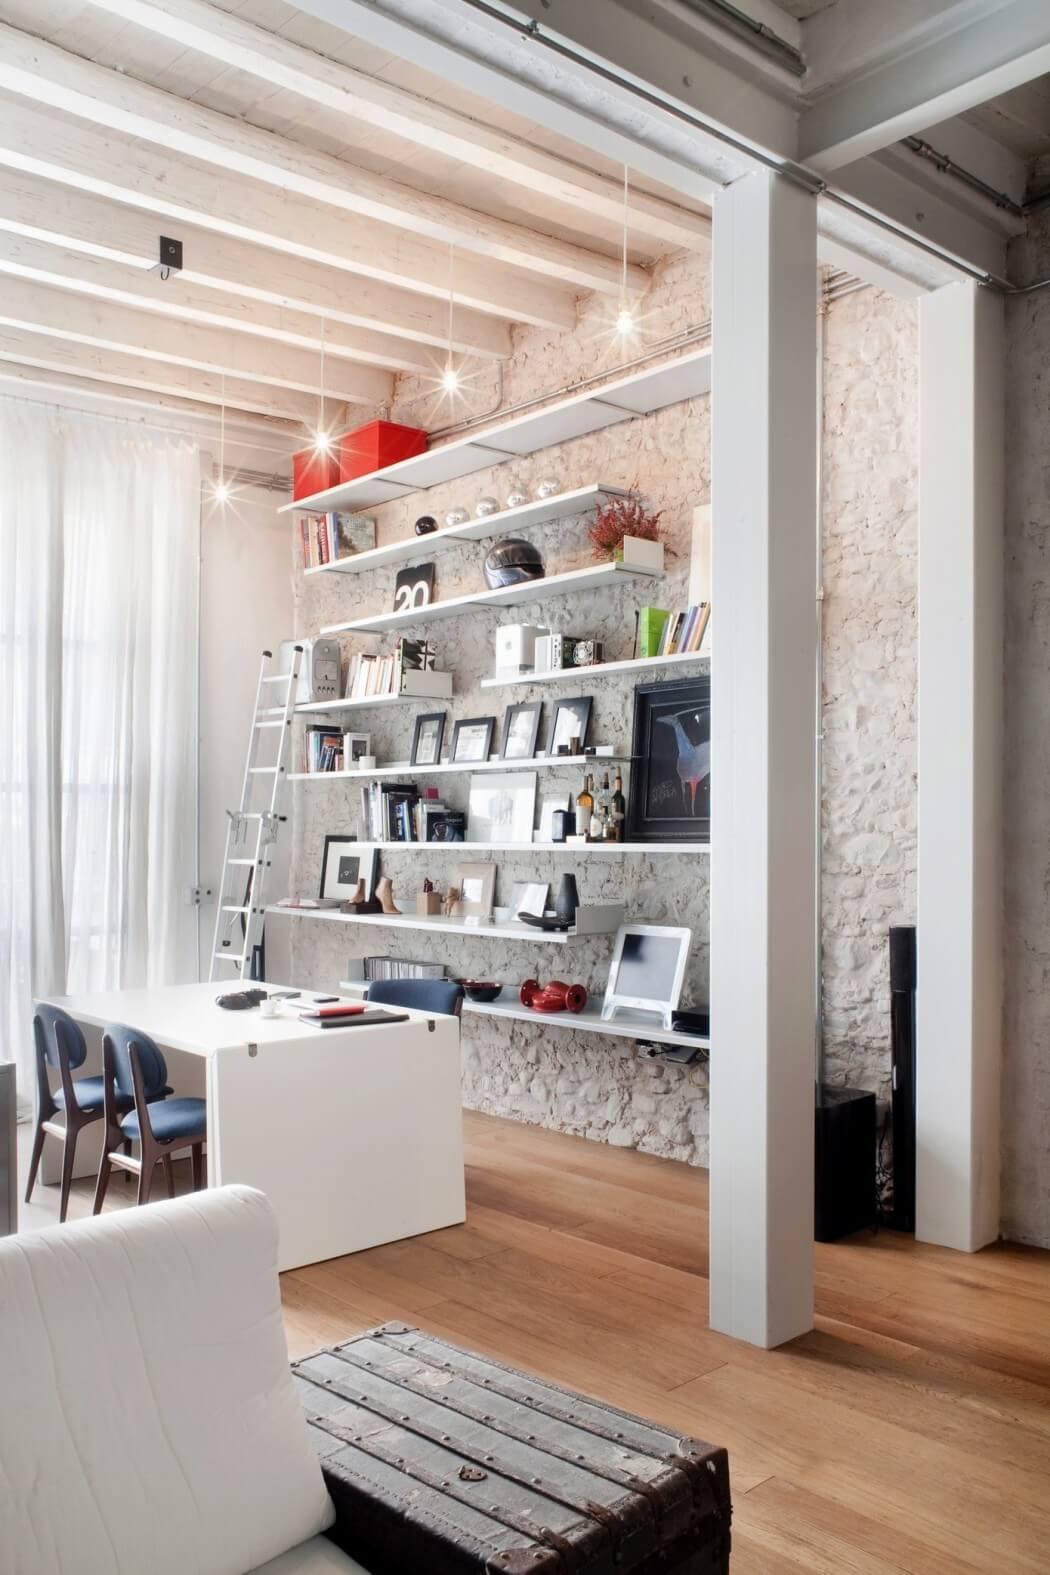 Loft appartement uit florence homease for Loft appartement